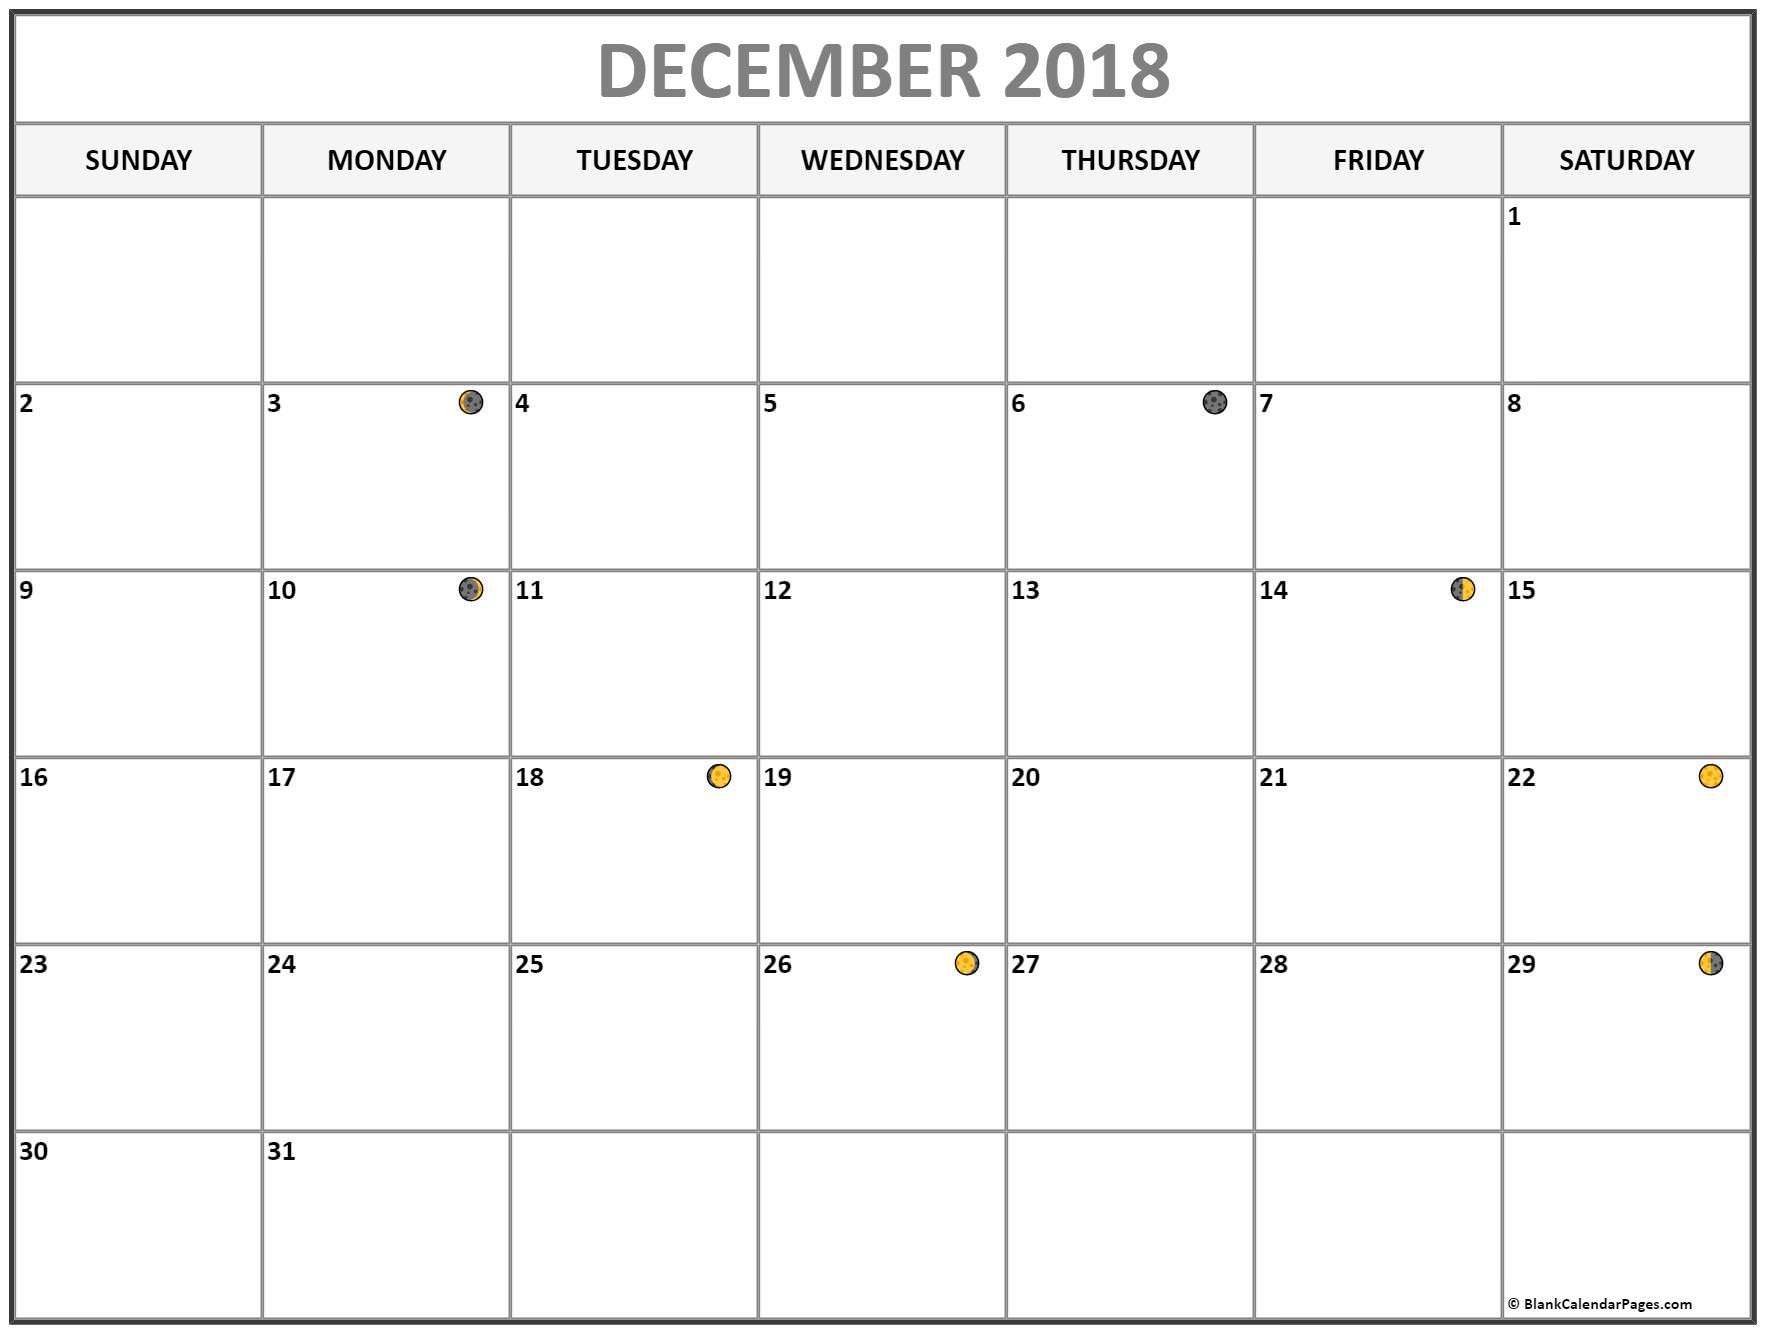 December 2018 Calendar Moon Phases